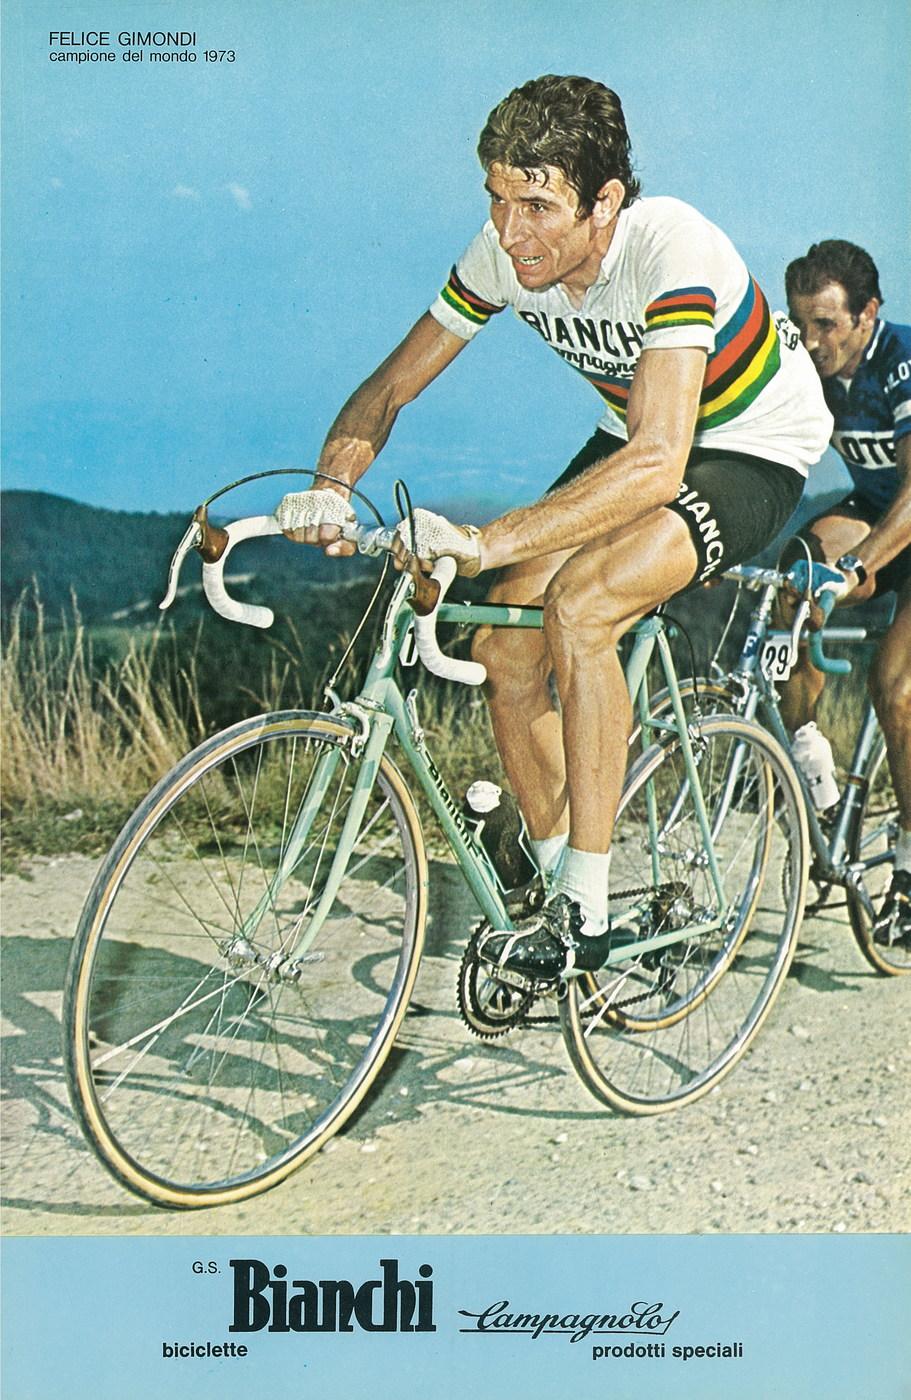 Felice Gimondi Bianchi Campagnolo